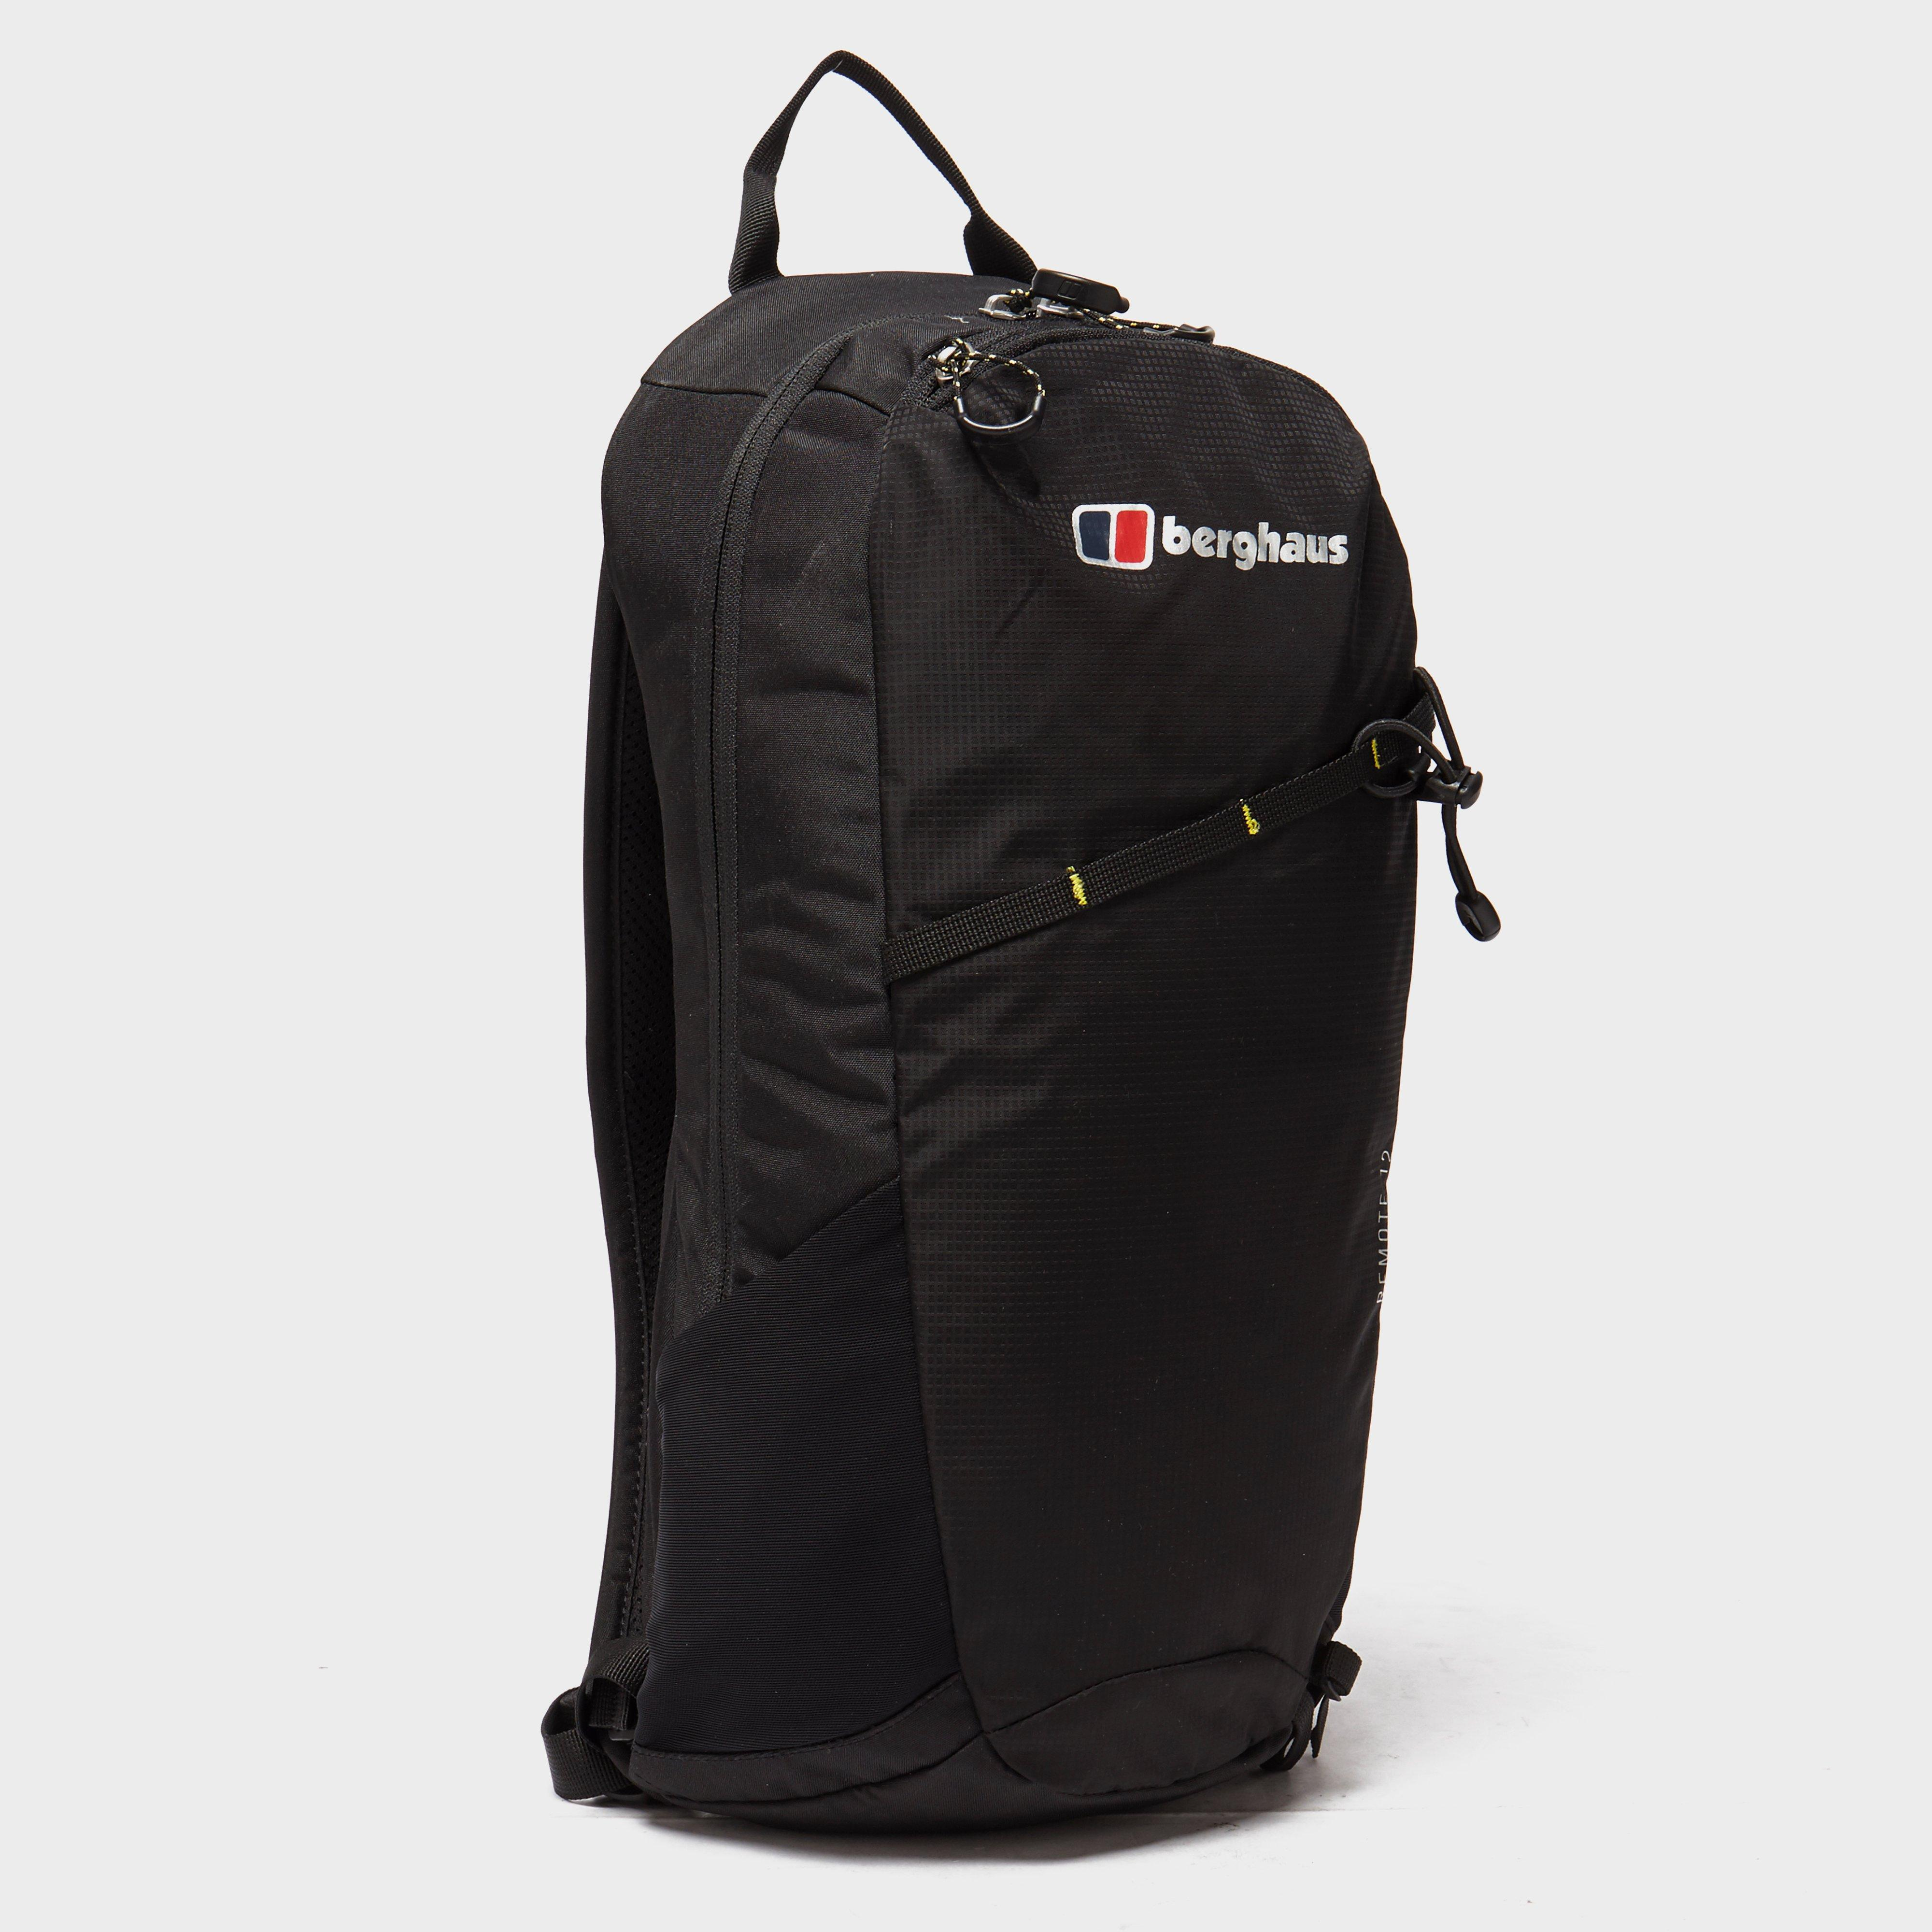 Berghaus Remote 12 Daypack, Black